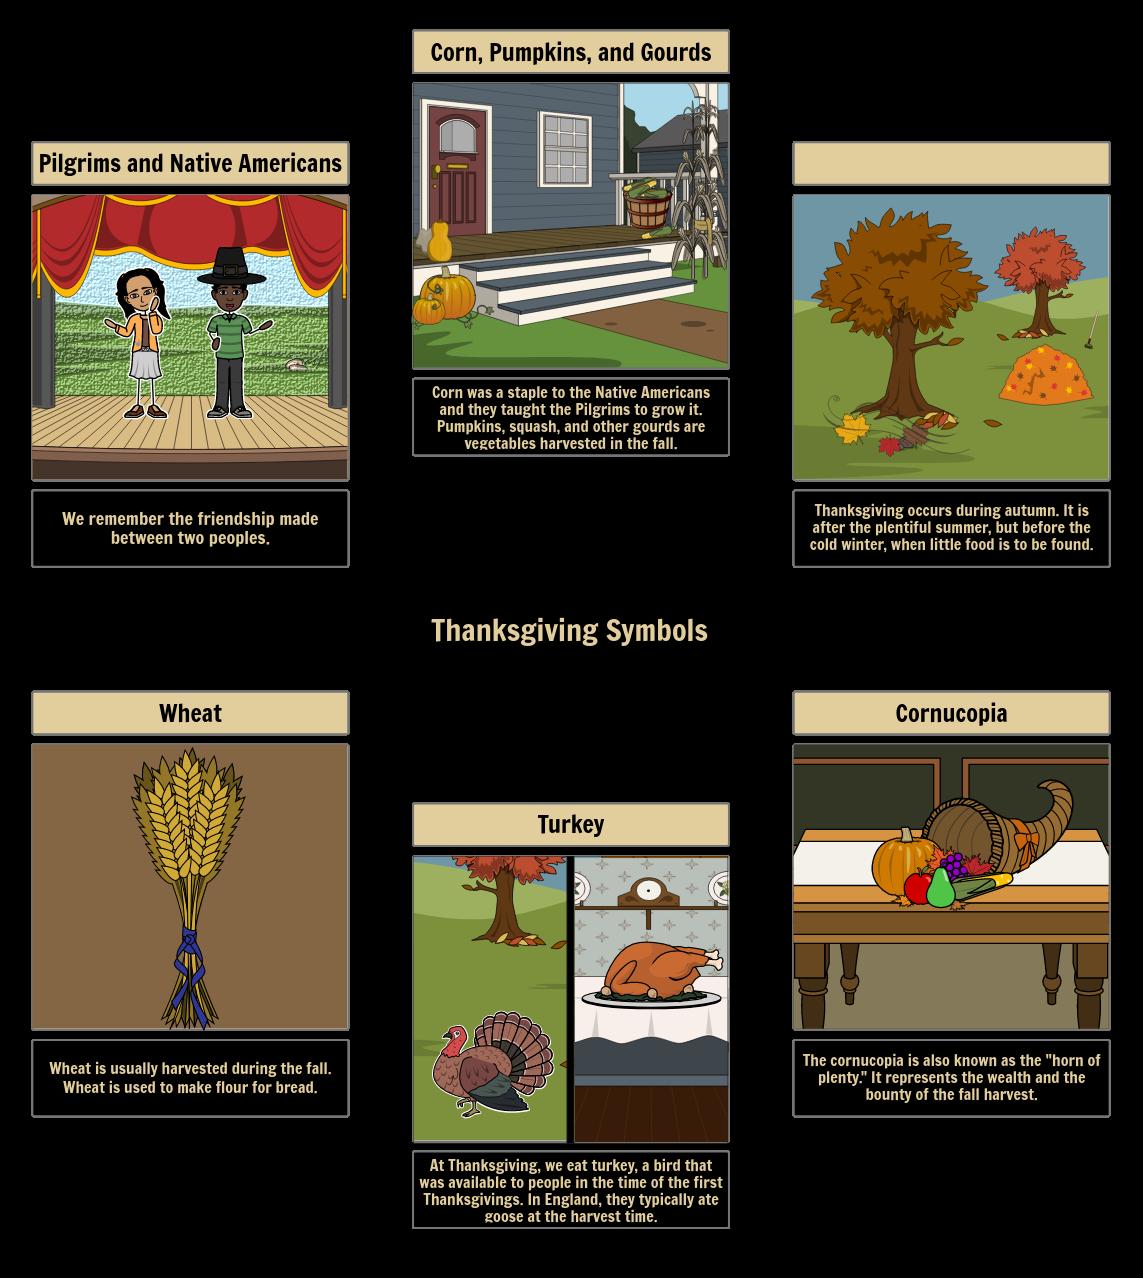 Thanksgiving - Symbols